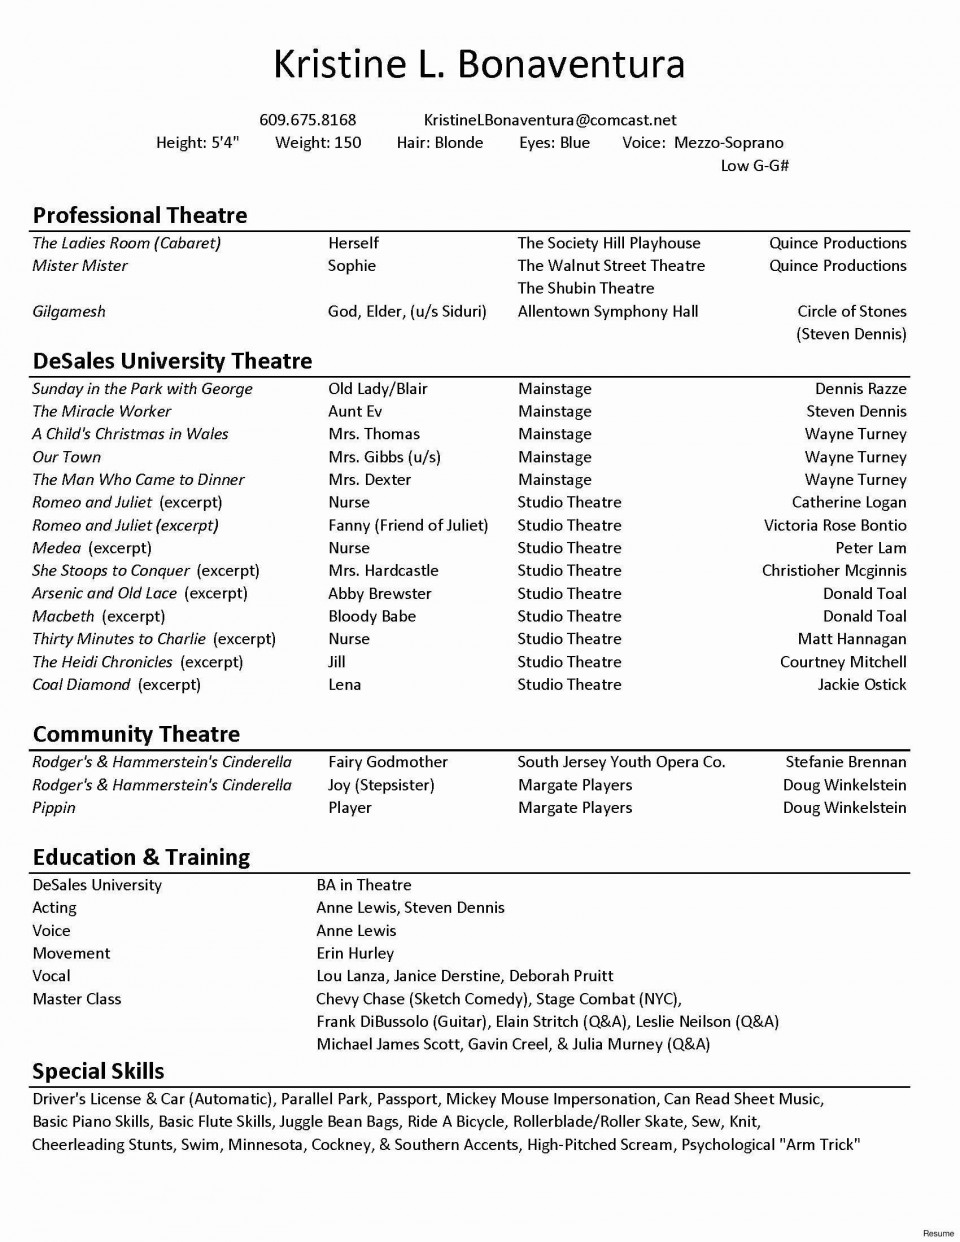 005 Sensational Technical Theatre Resume Template Concept  Google Doc Tech960